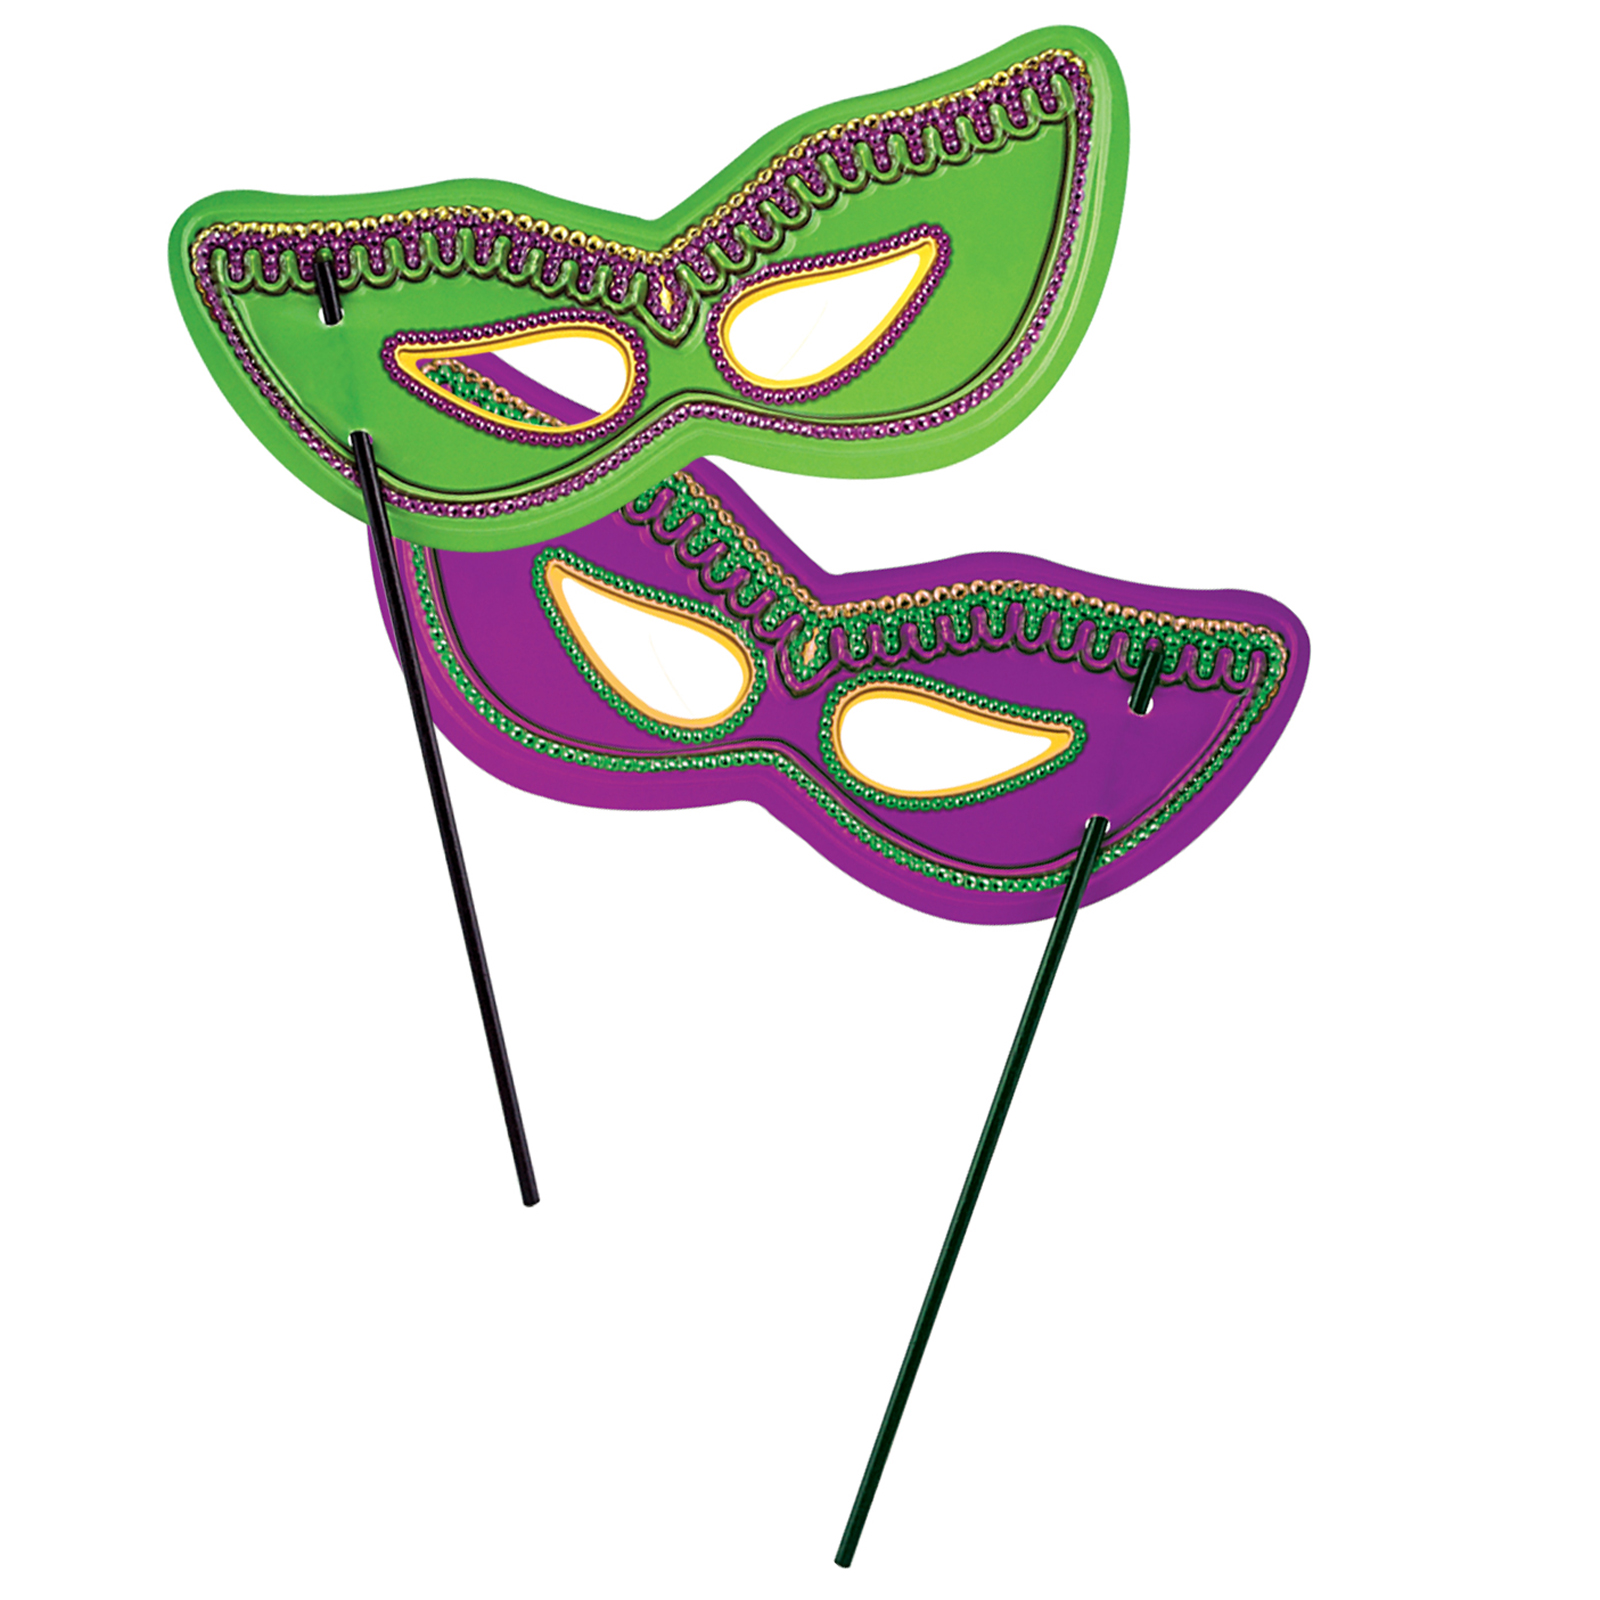 1600x1600 Pictures Mardi Gras Masks